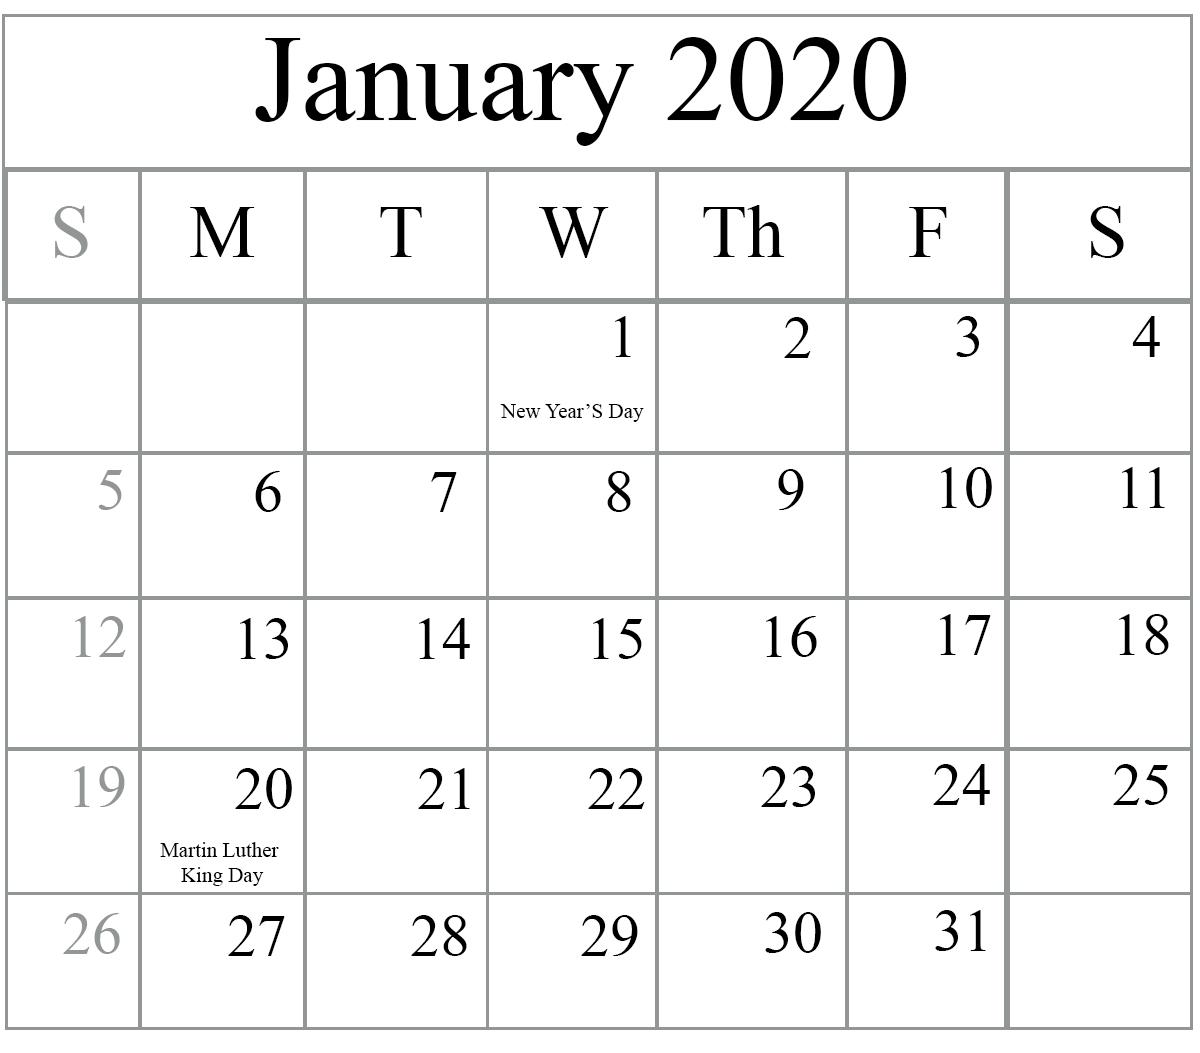 Free January 2020 Printable Calendar In Pdf, Excel & Word pertaining to 2020 Calendar Printable Free Pdf